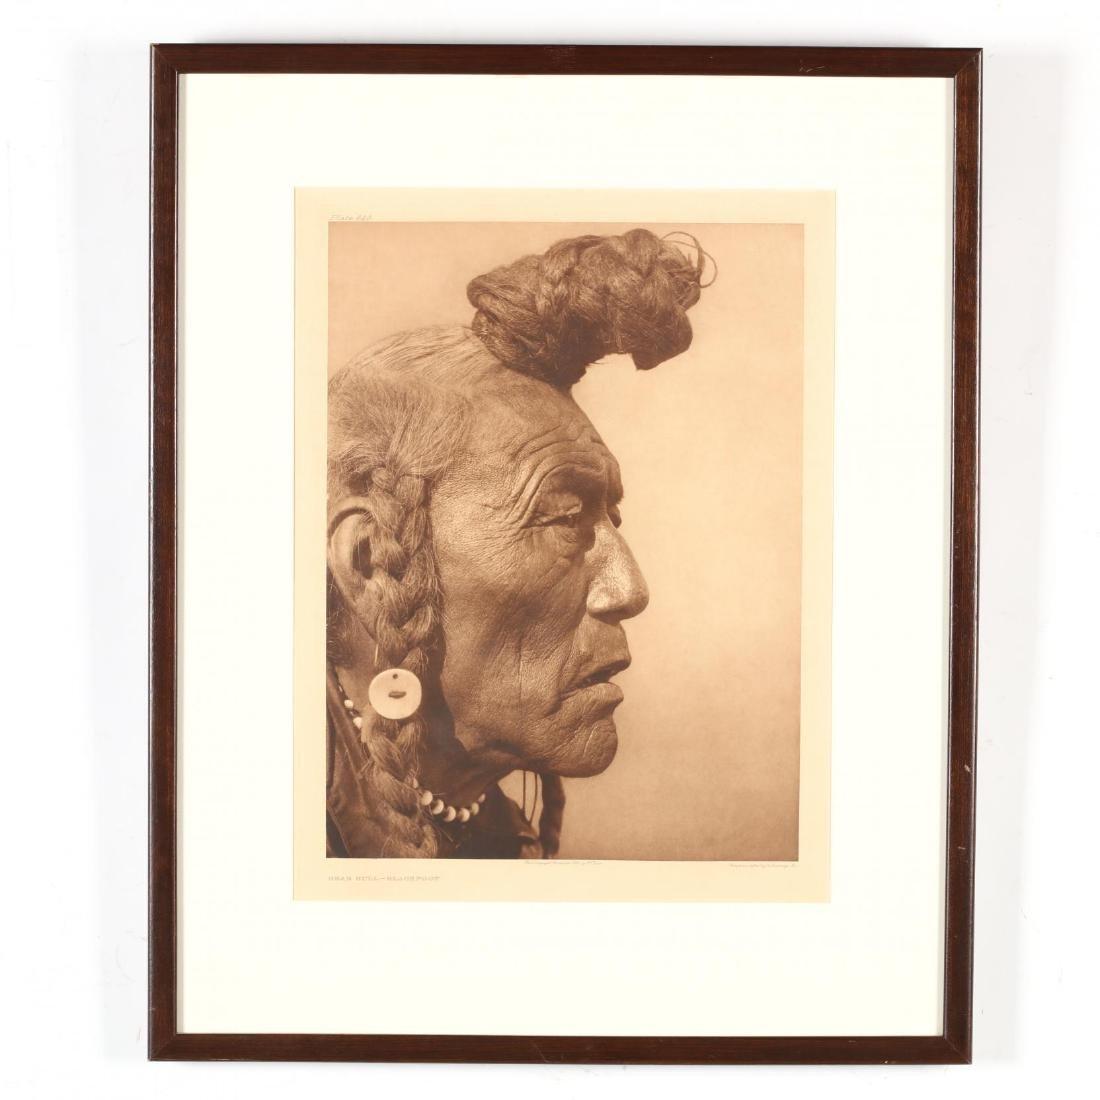 Edward S. Curtis (American, 1868-1952),  Bear Bull -